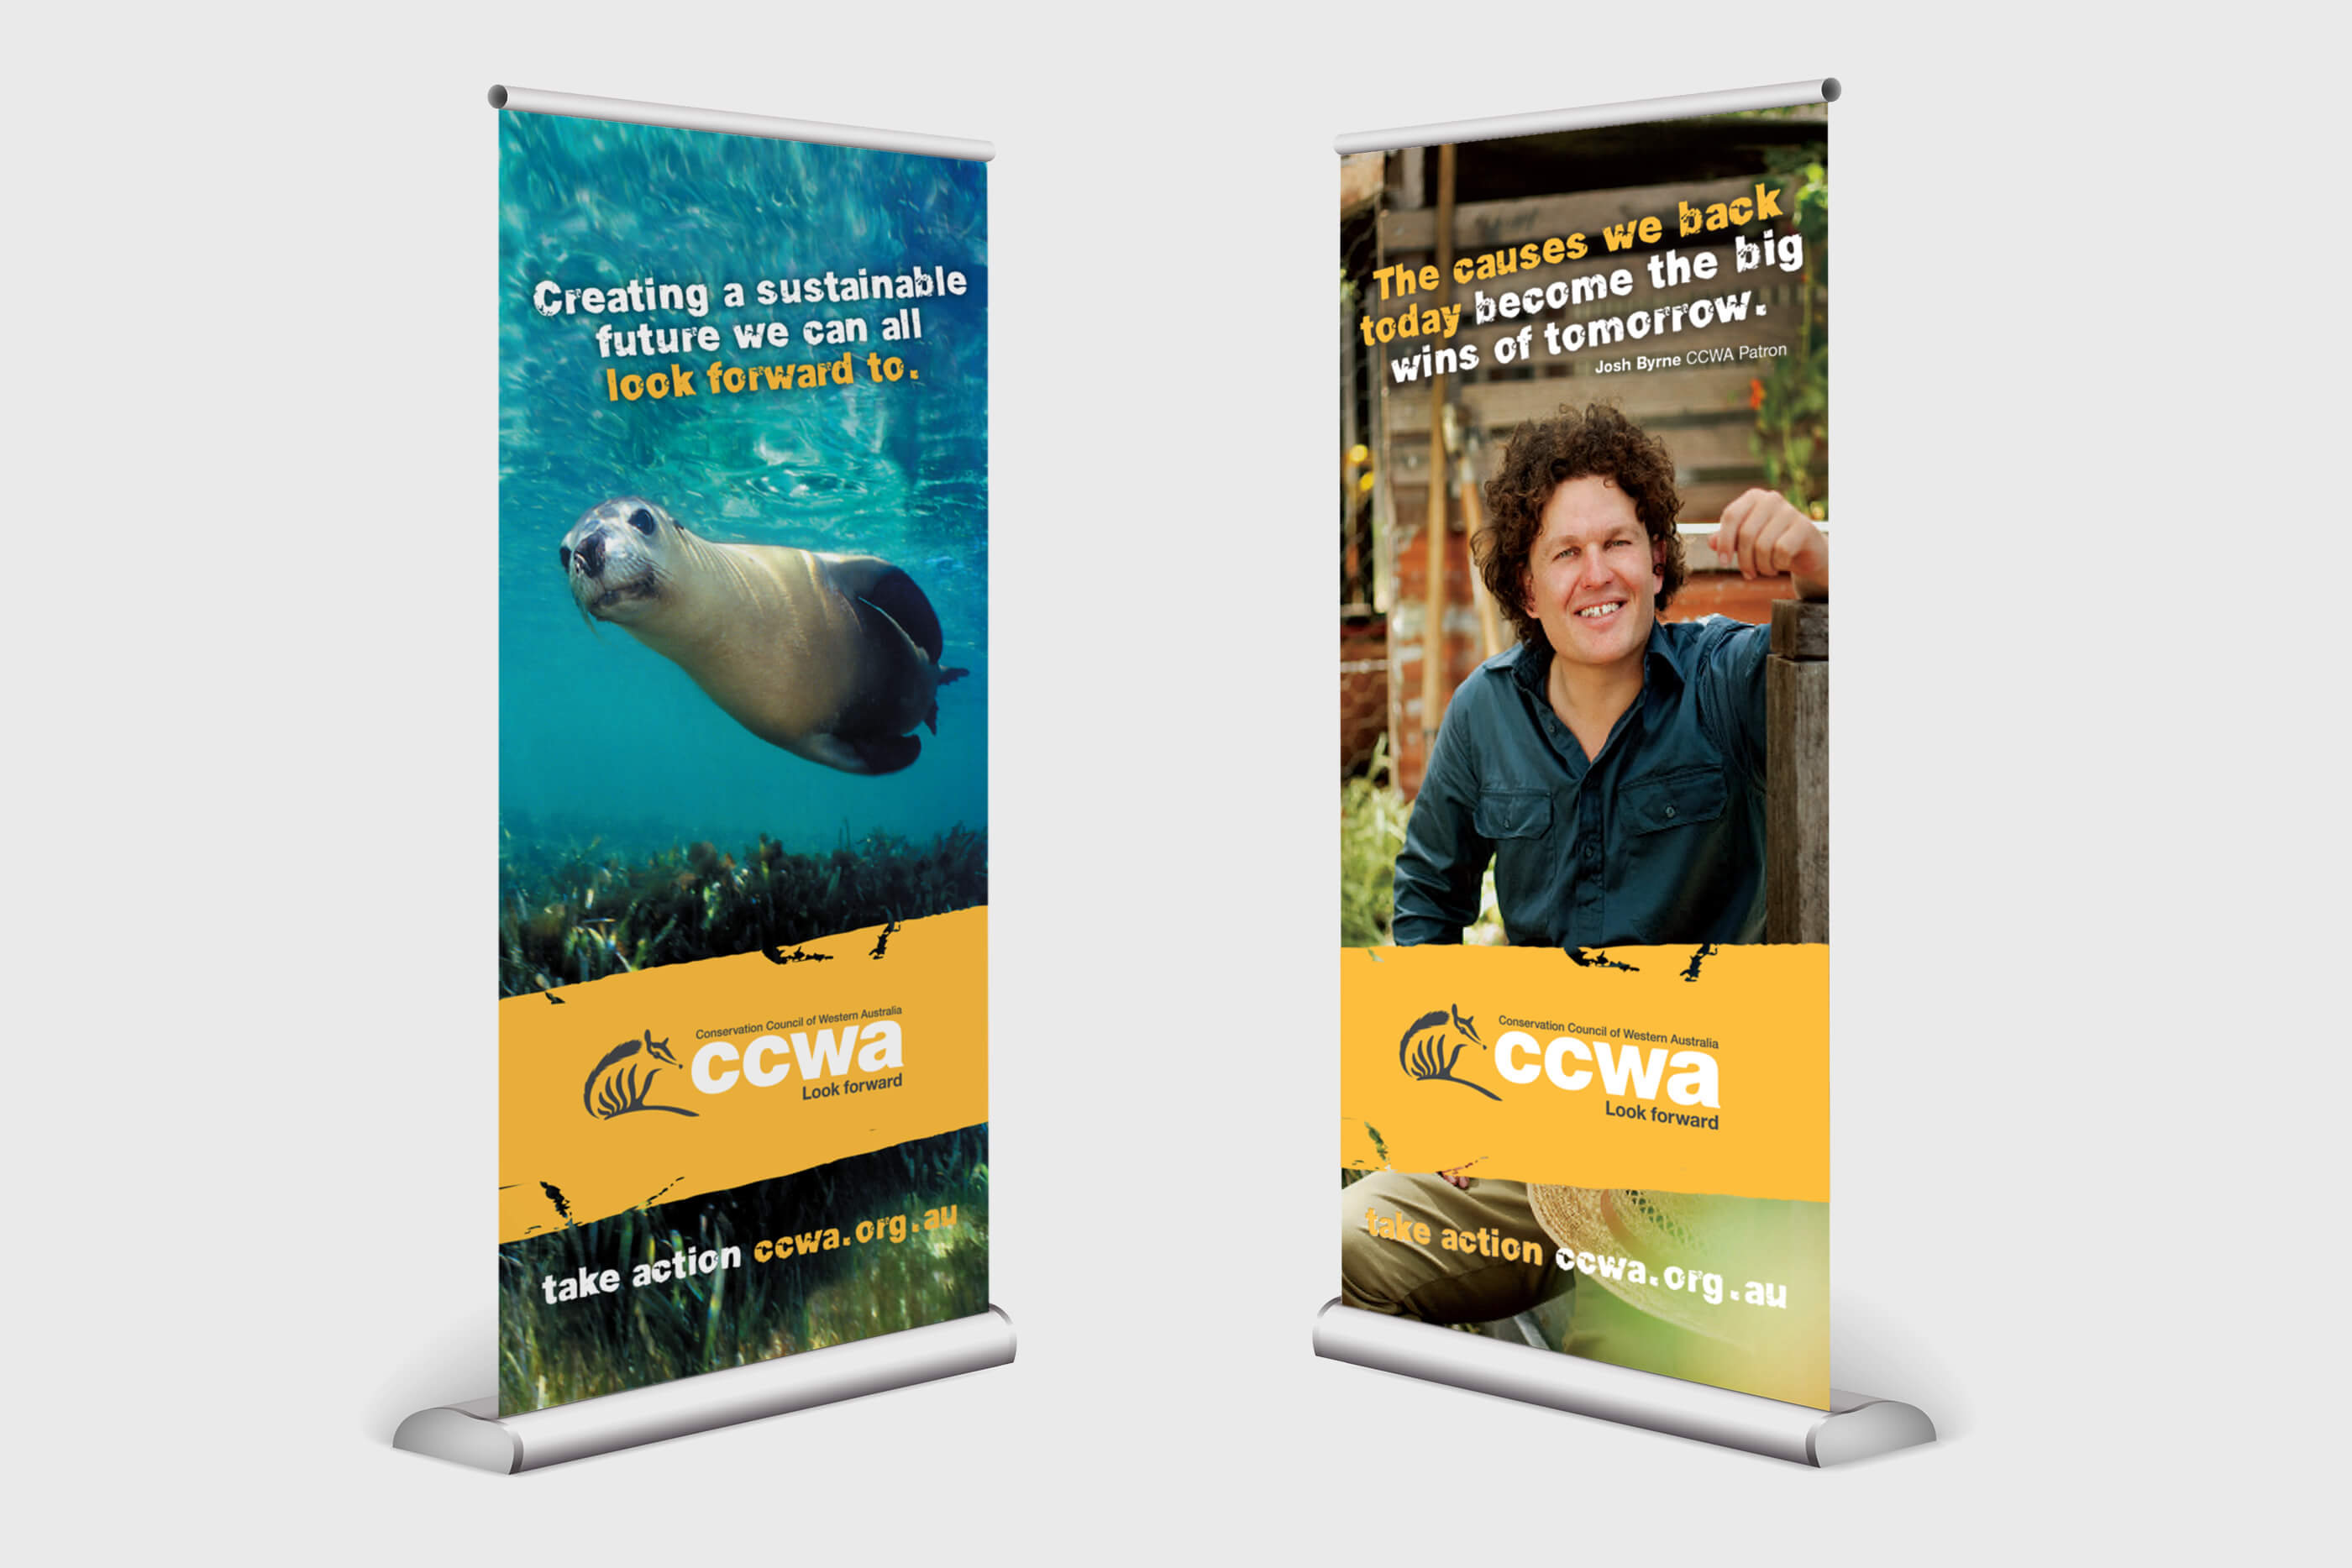 ccwa_banners